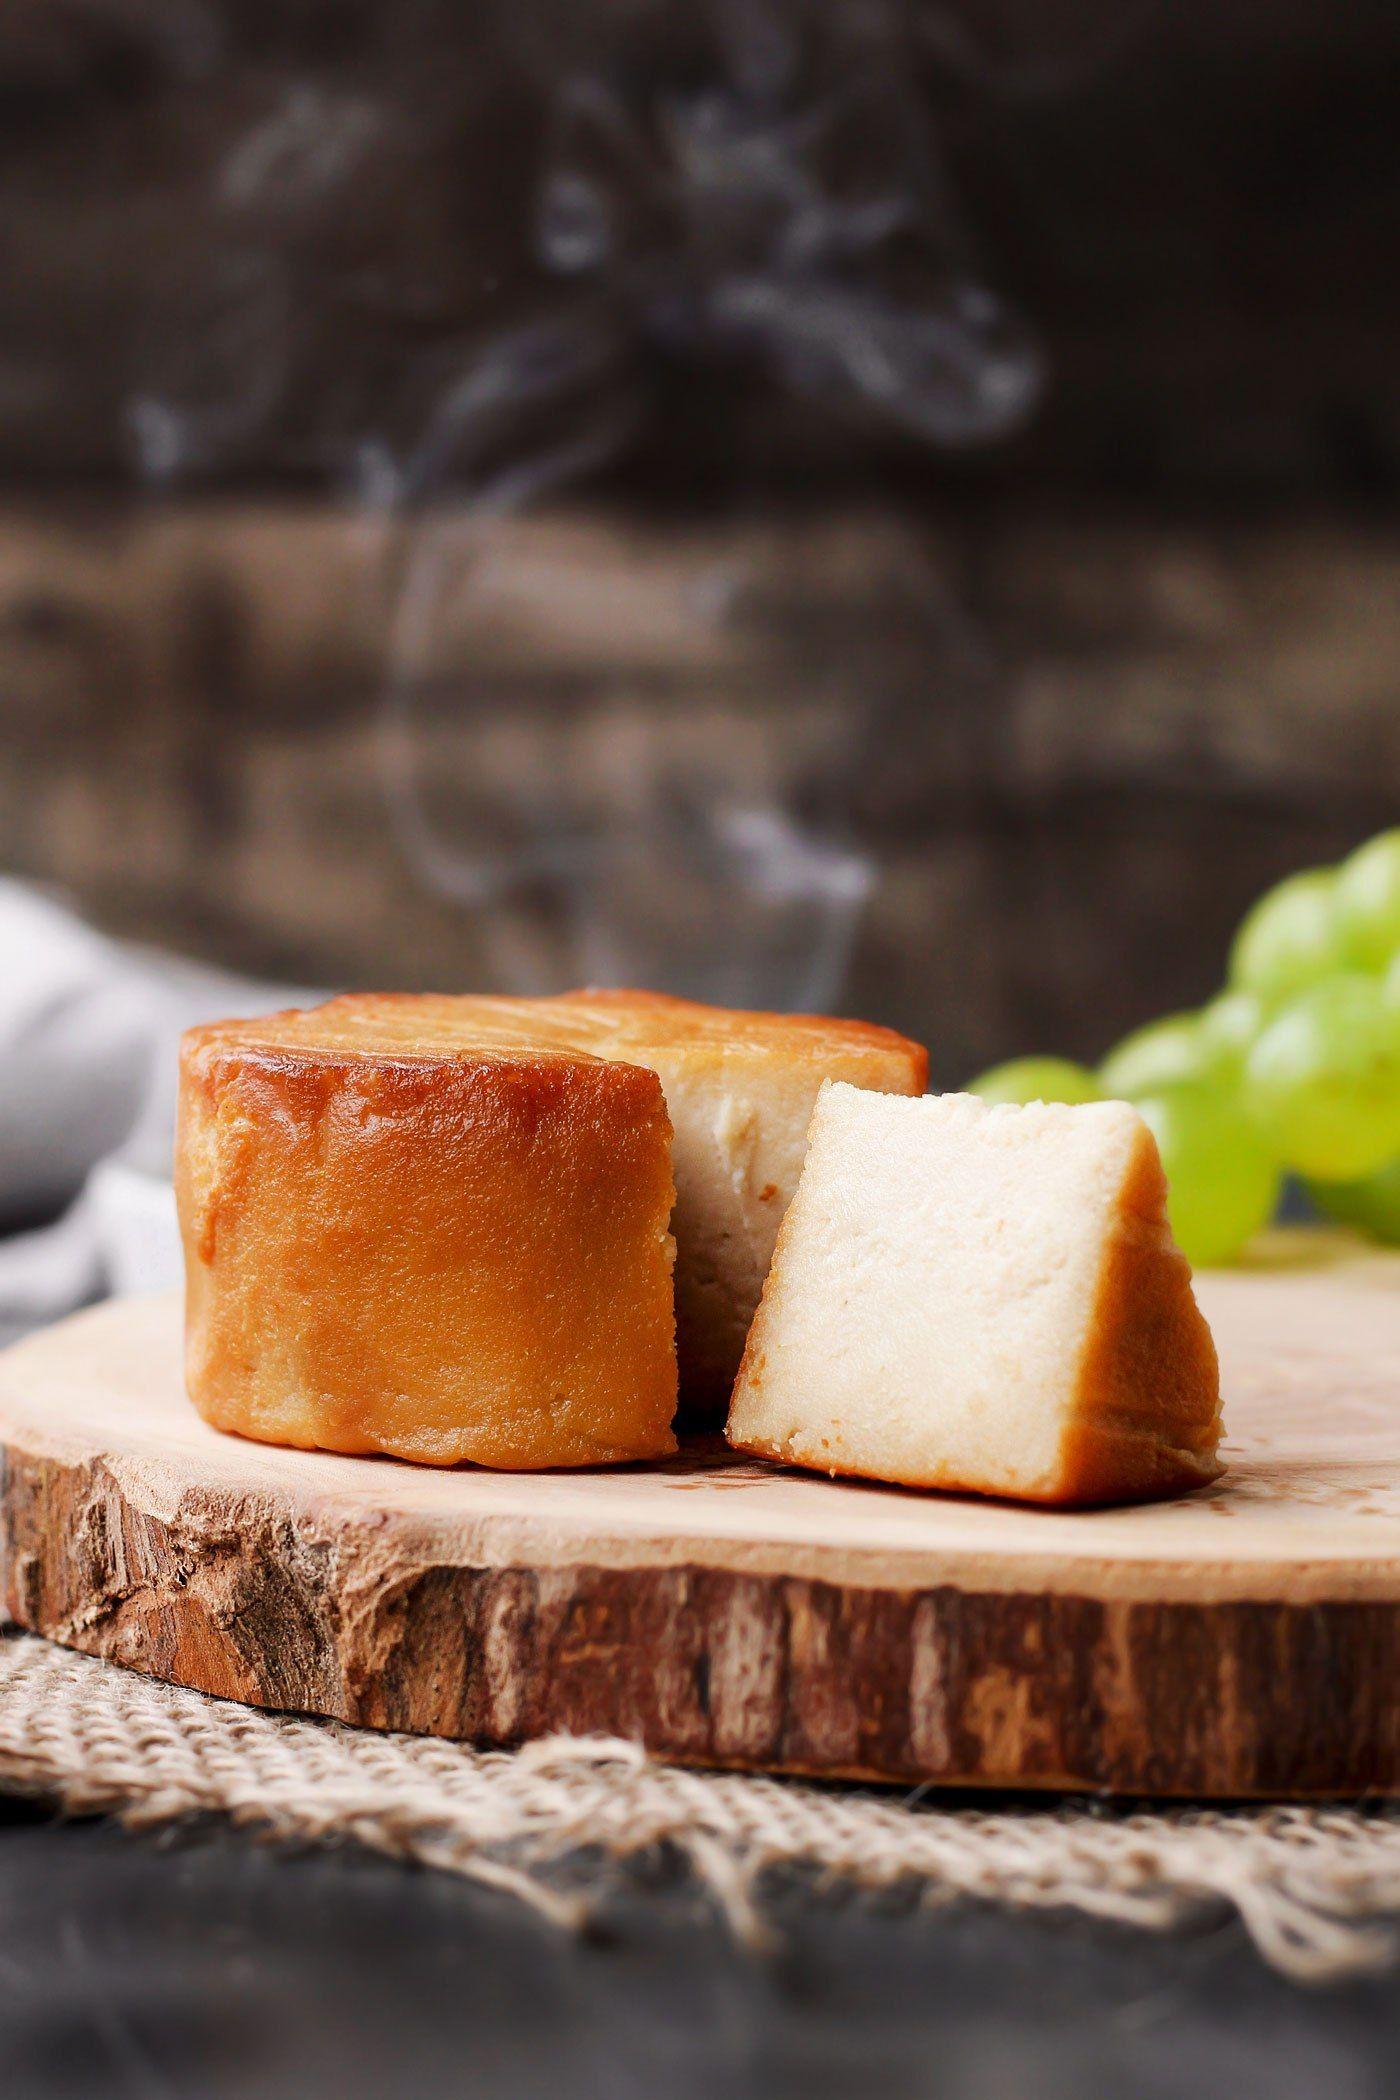 Hickory Smoked Vegan Cheese Full Of Plants Vegan Cheese Recipes Vegan Cheese Food